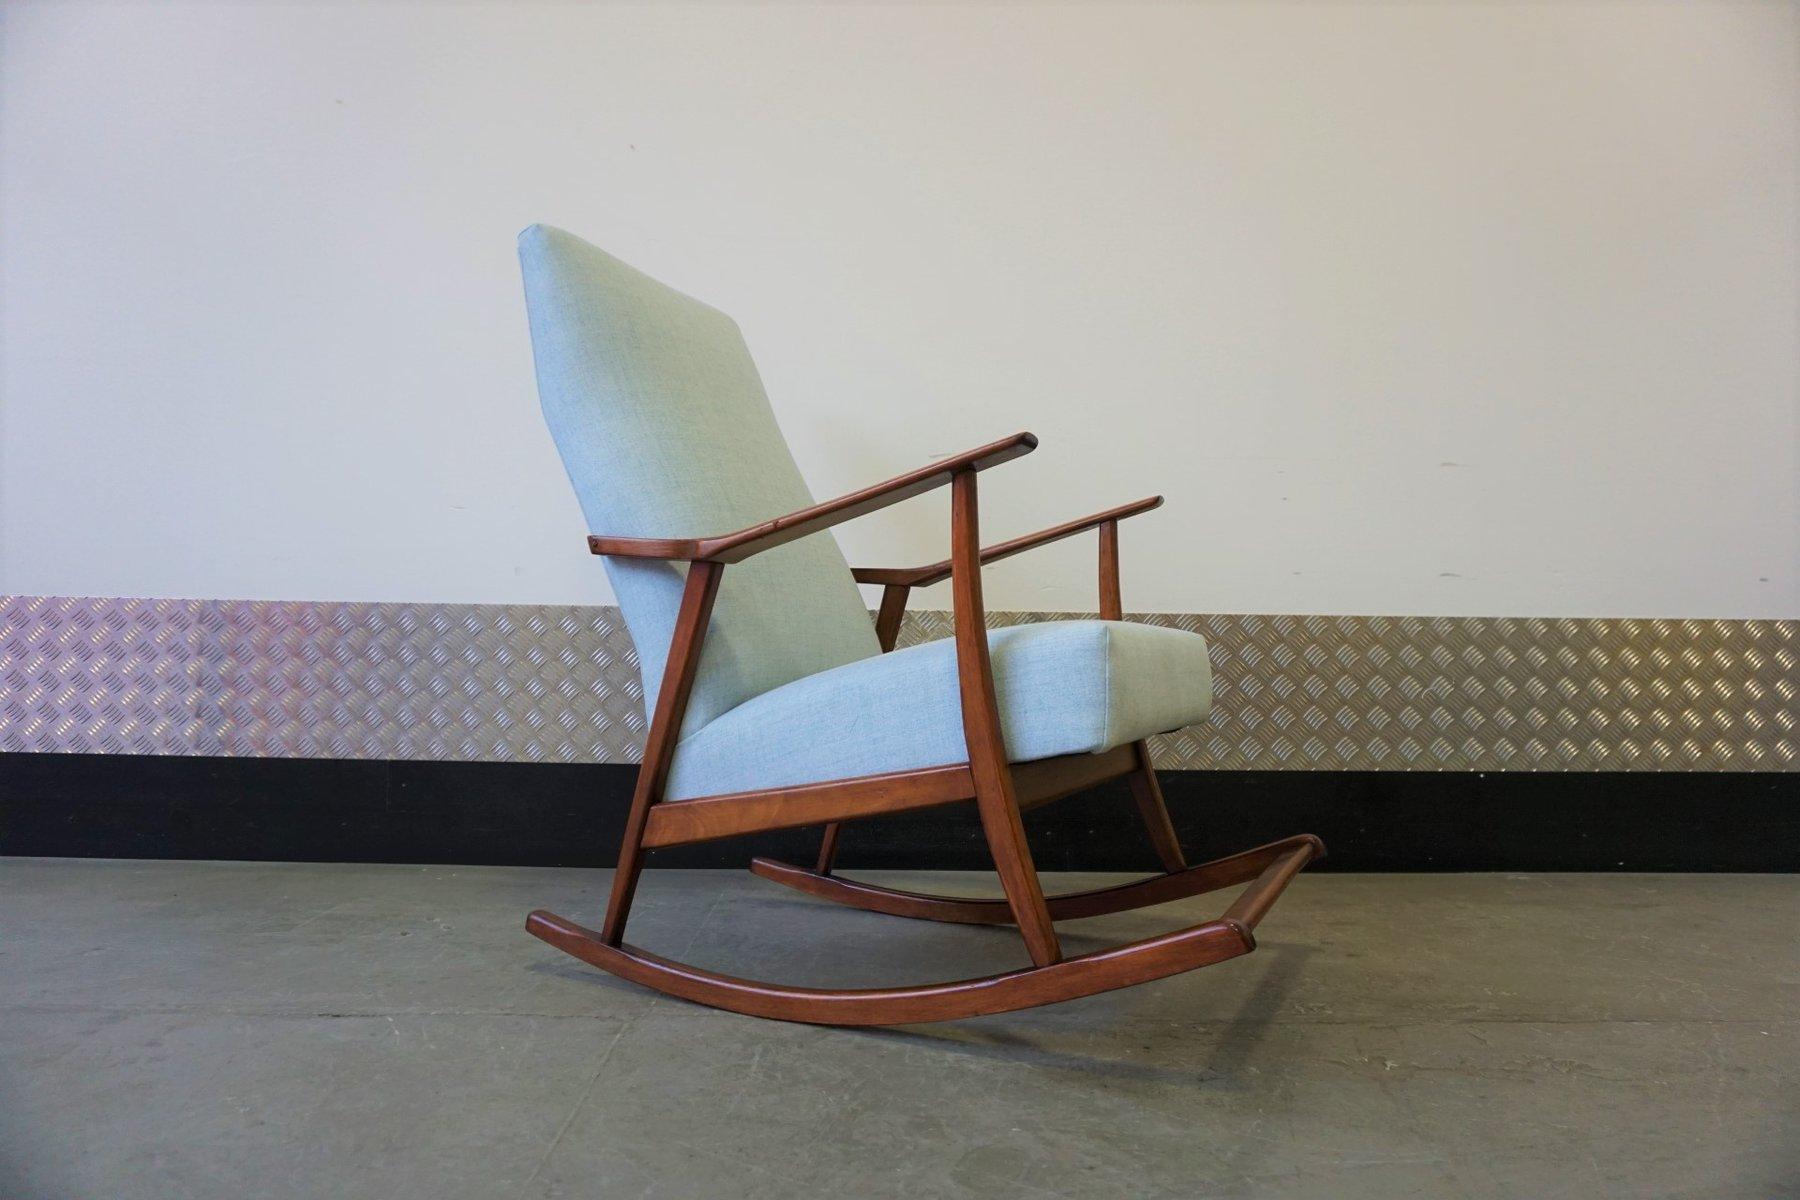 century hermann albert for by piece fleiner rocking per wingback chair price haberer mid